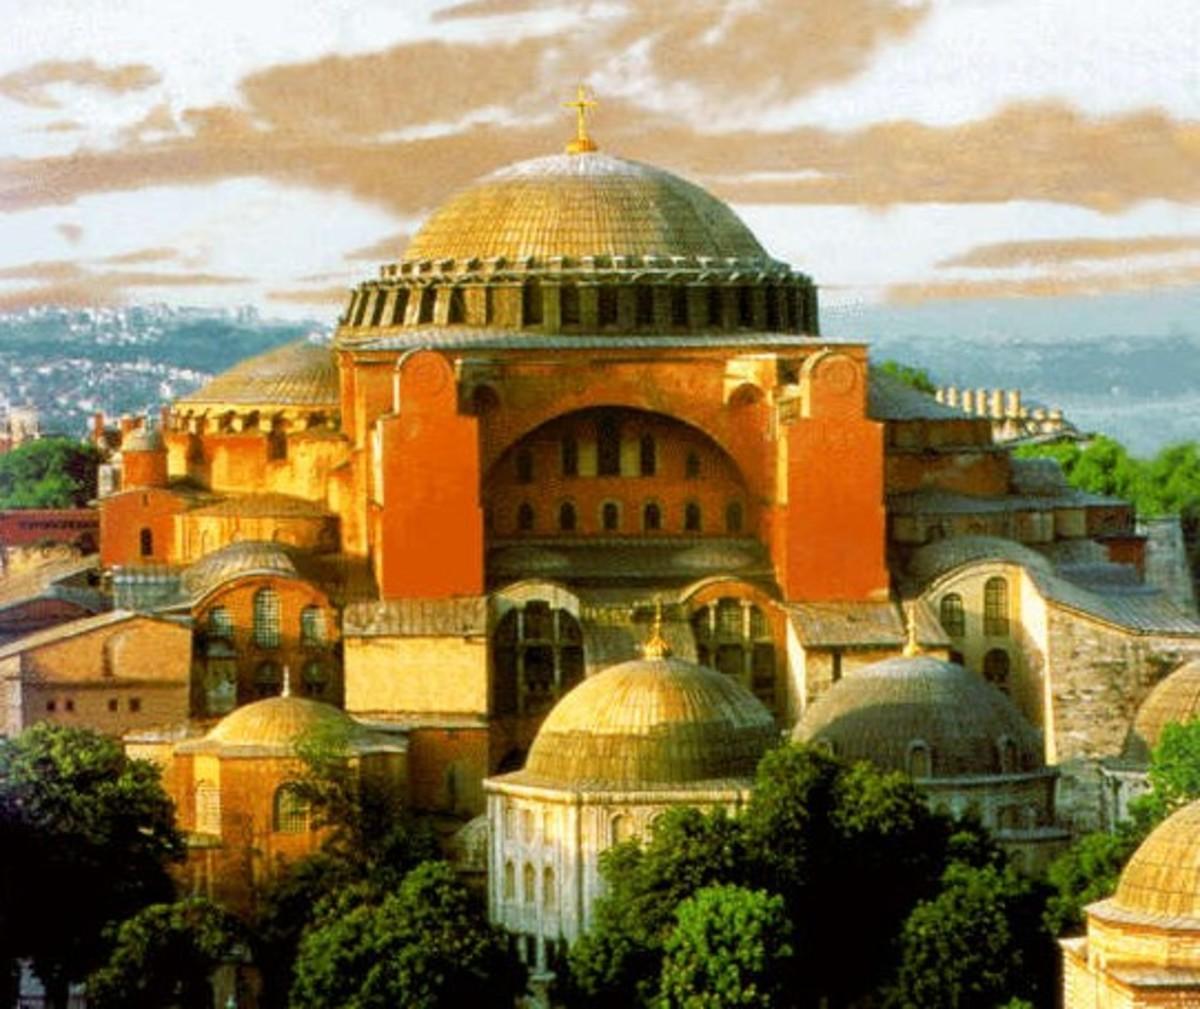 HAGIA SOPHIA CHURCH OF CONSTANTINOPLE